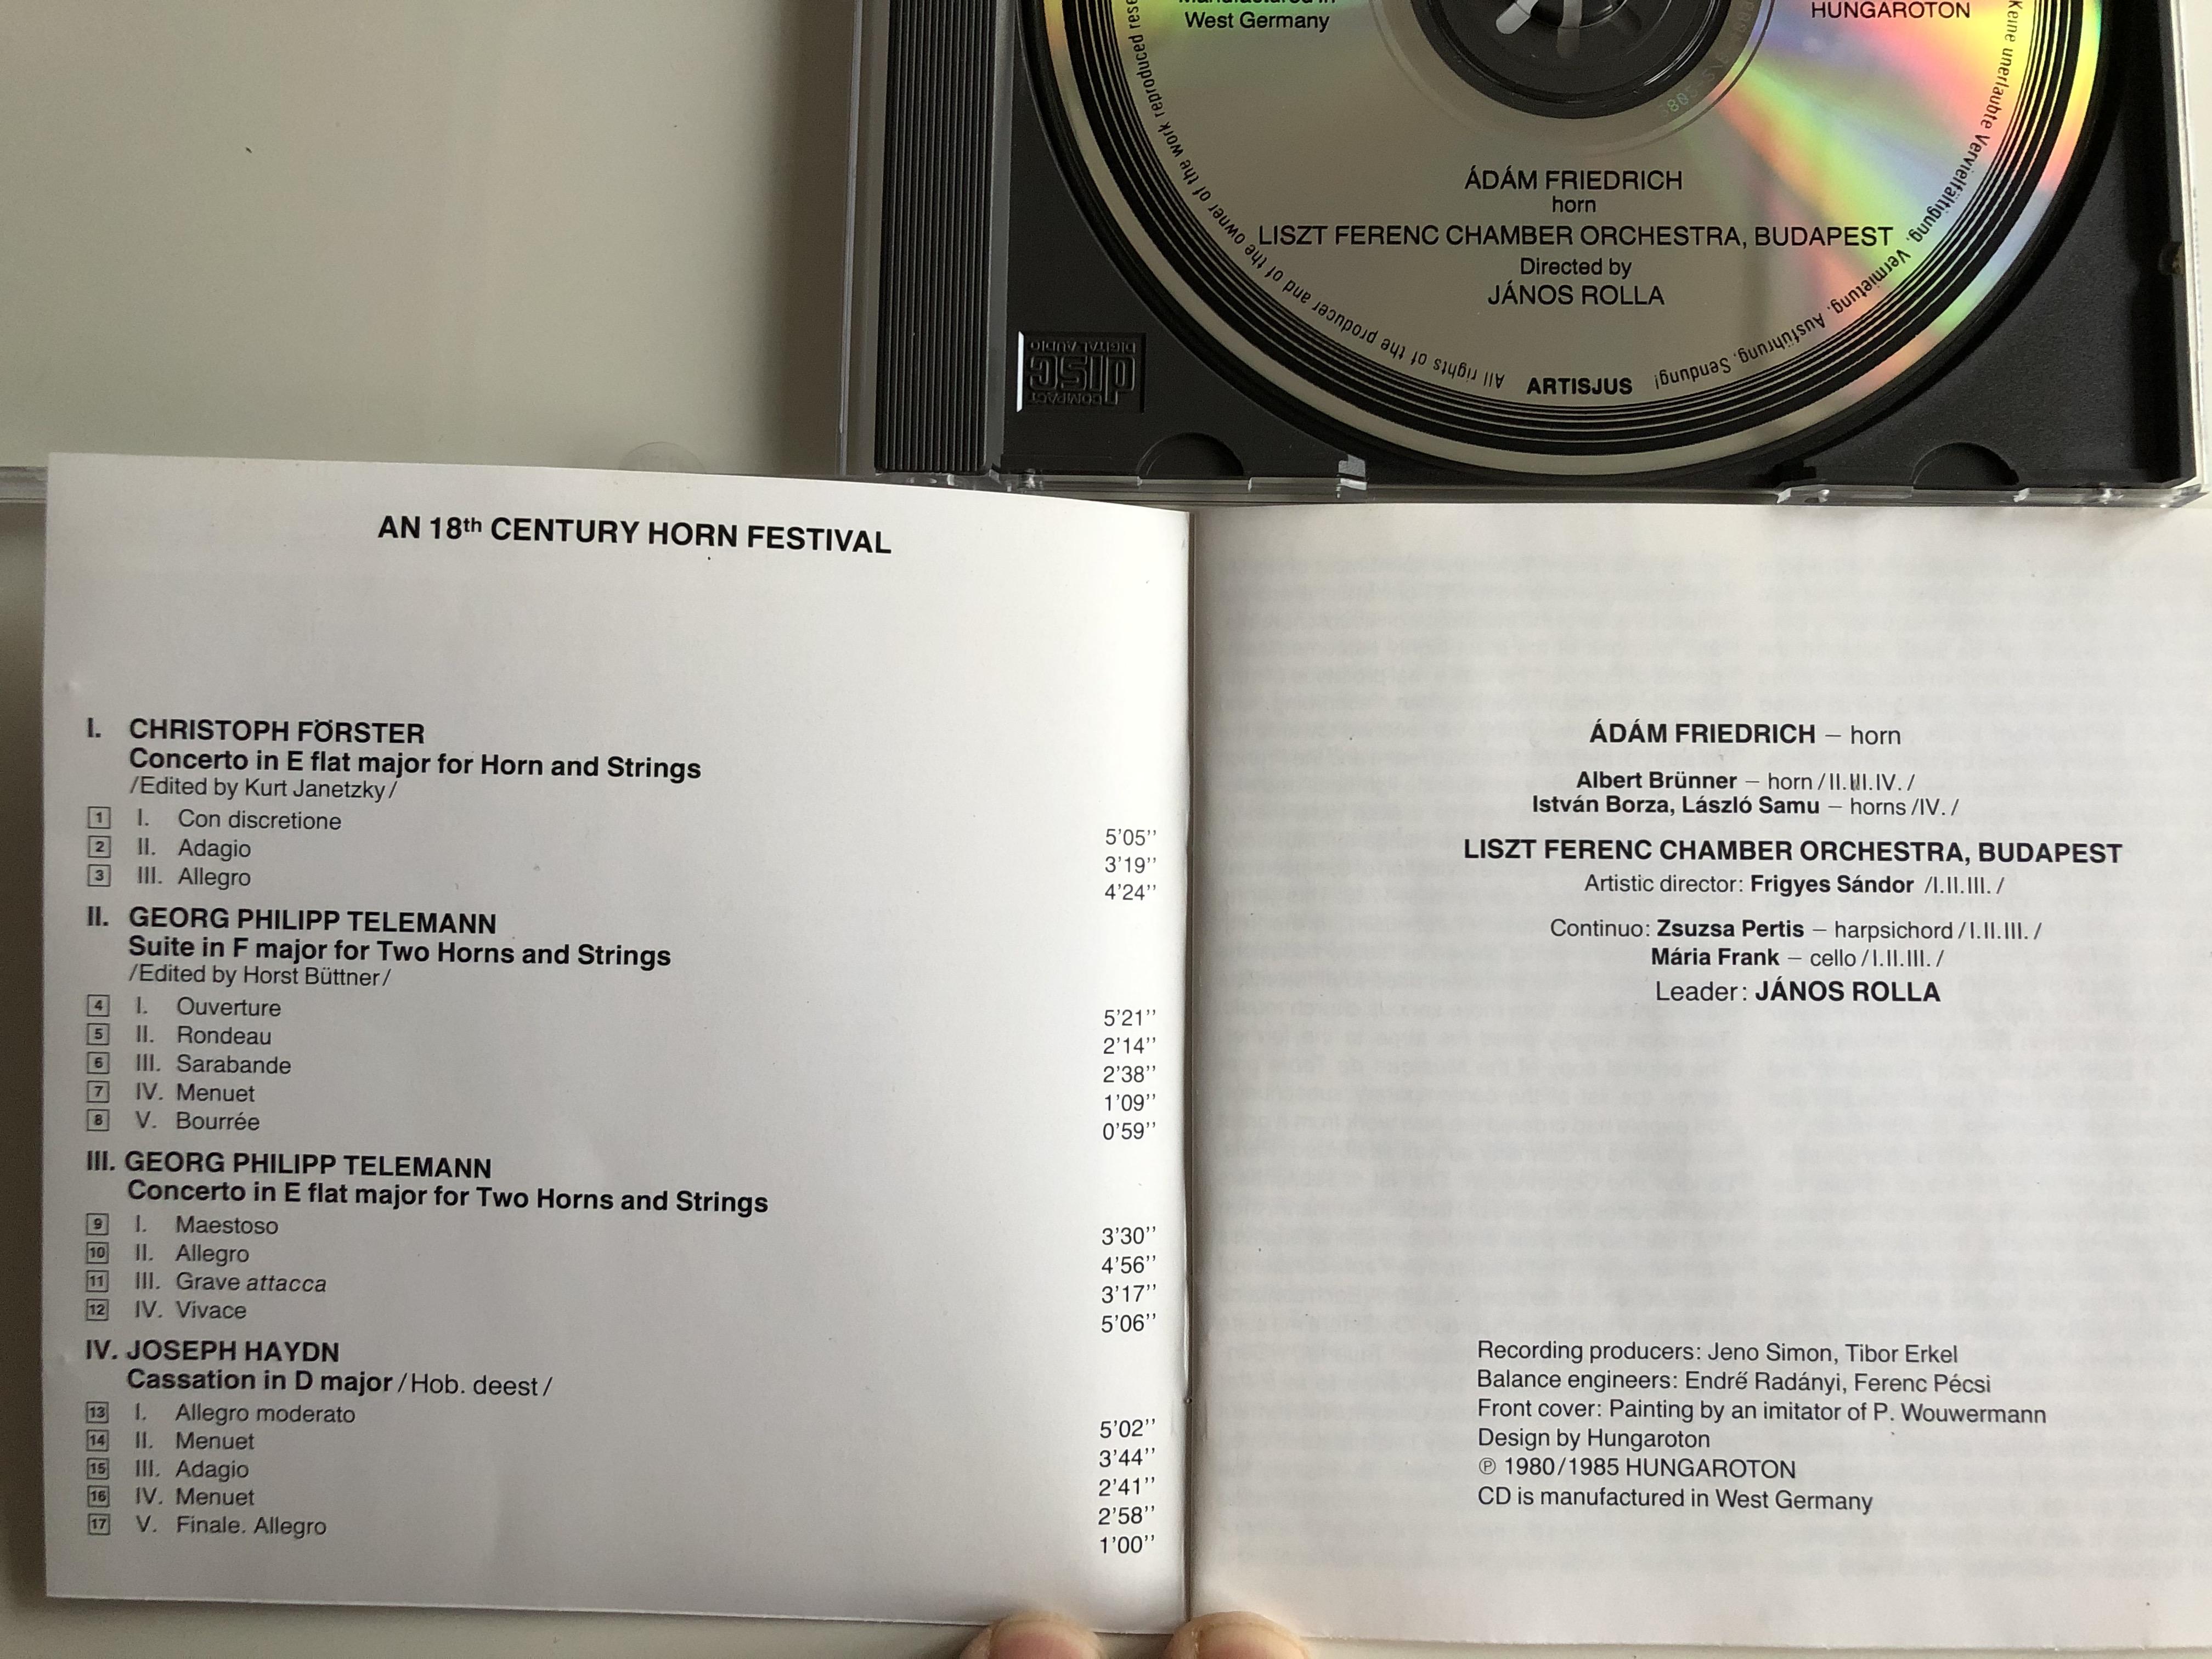 an-18th-century-horn-festival-forster-telemann-haydn-adam-friedrich-liszt-ferenc-chamber-orchestra-budapest-janos-rolla-hungaroton-audio-cd-stereo-hcd-12802-2-3-.jpg